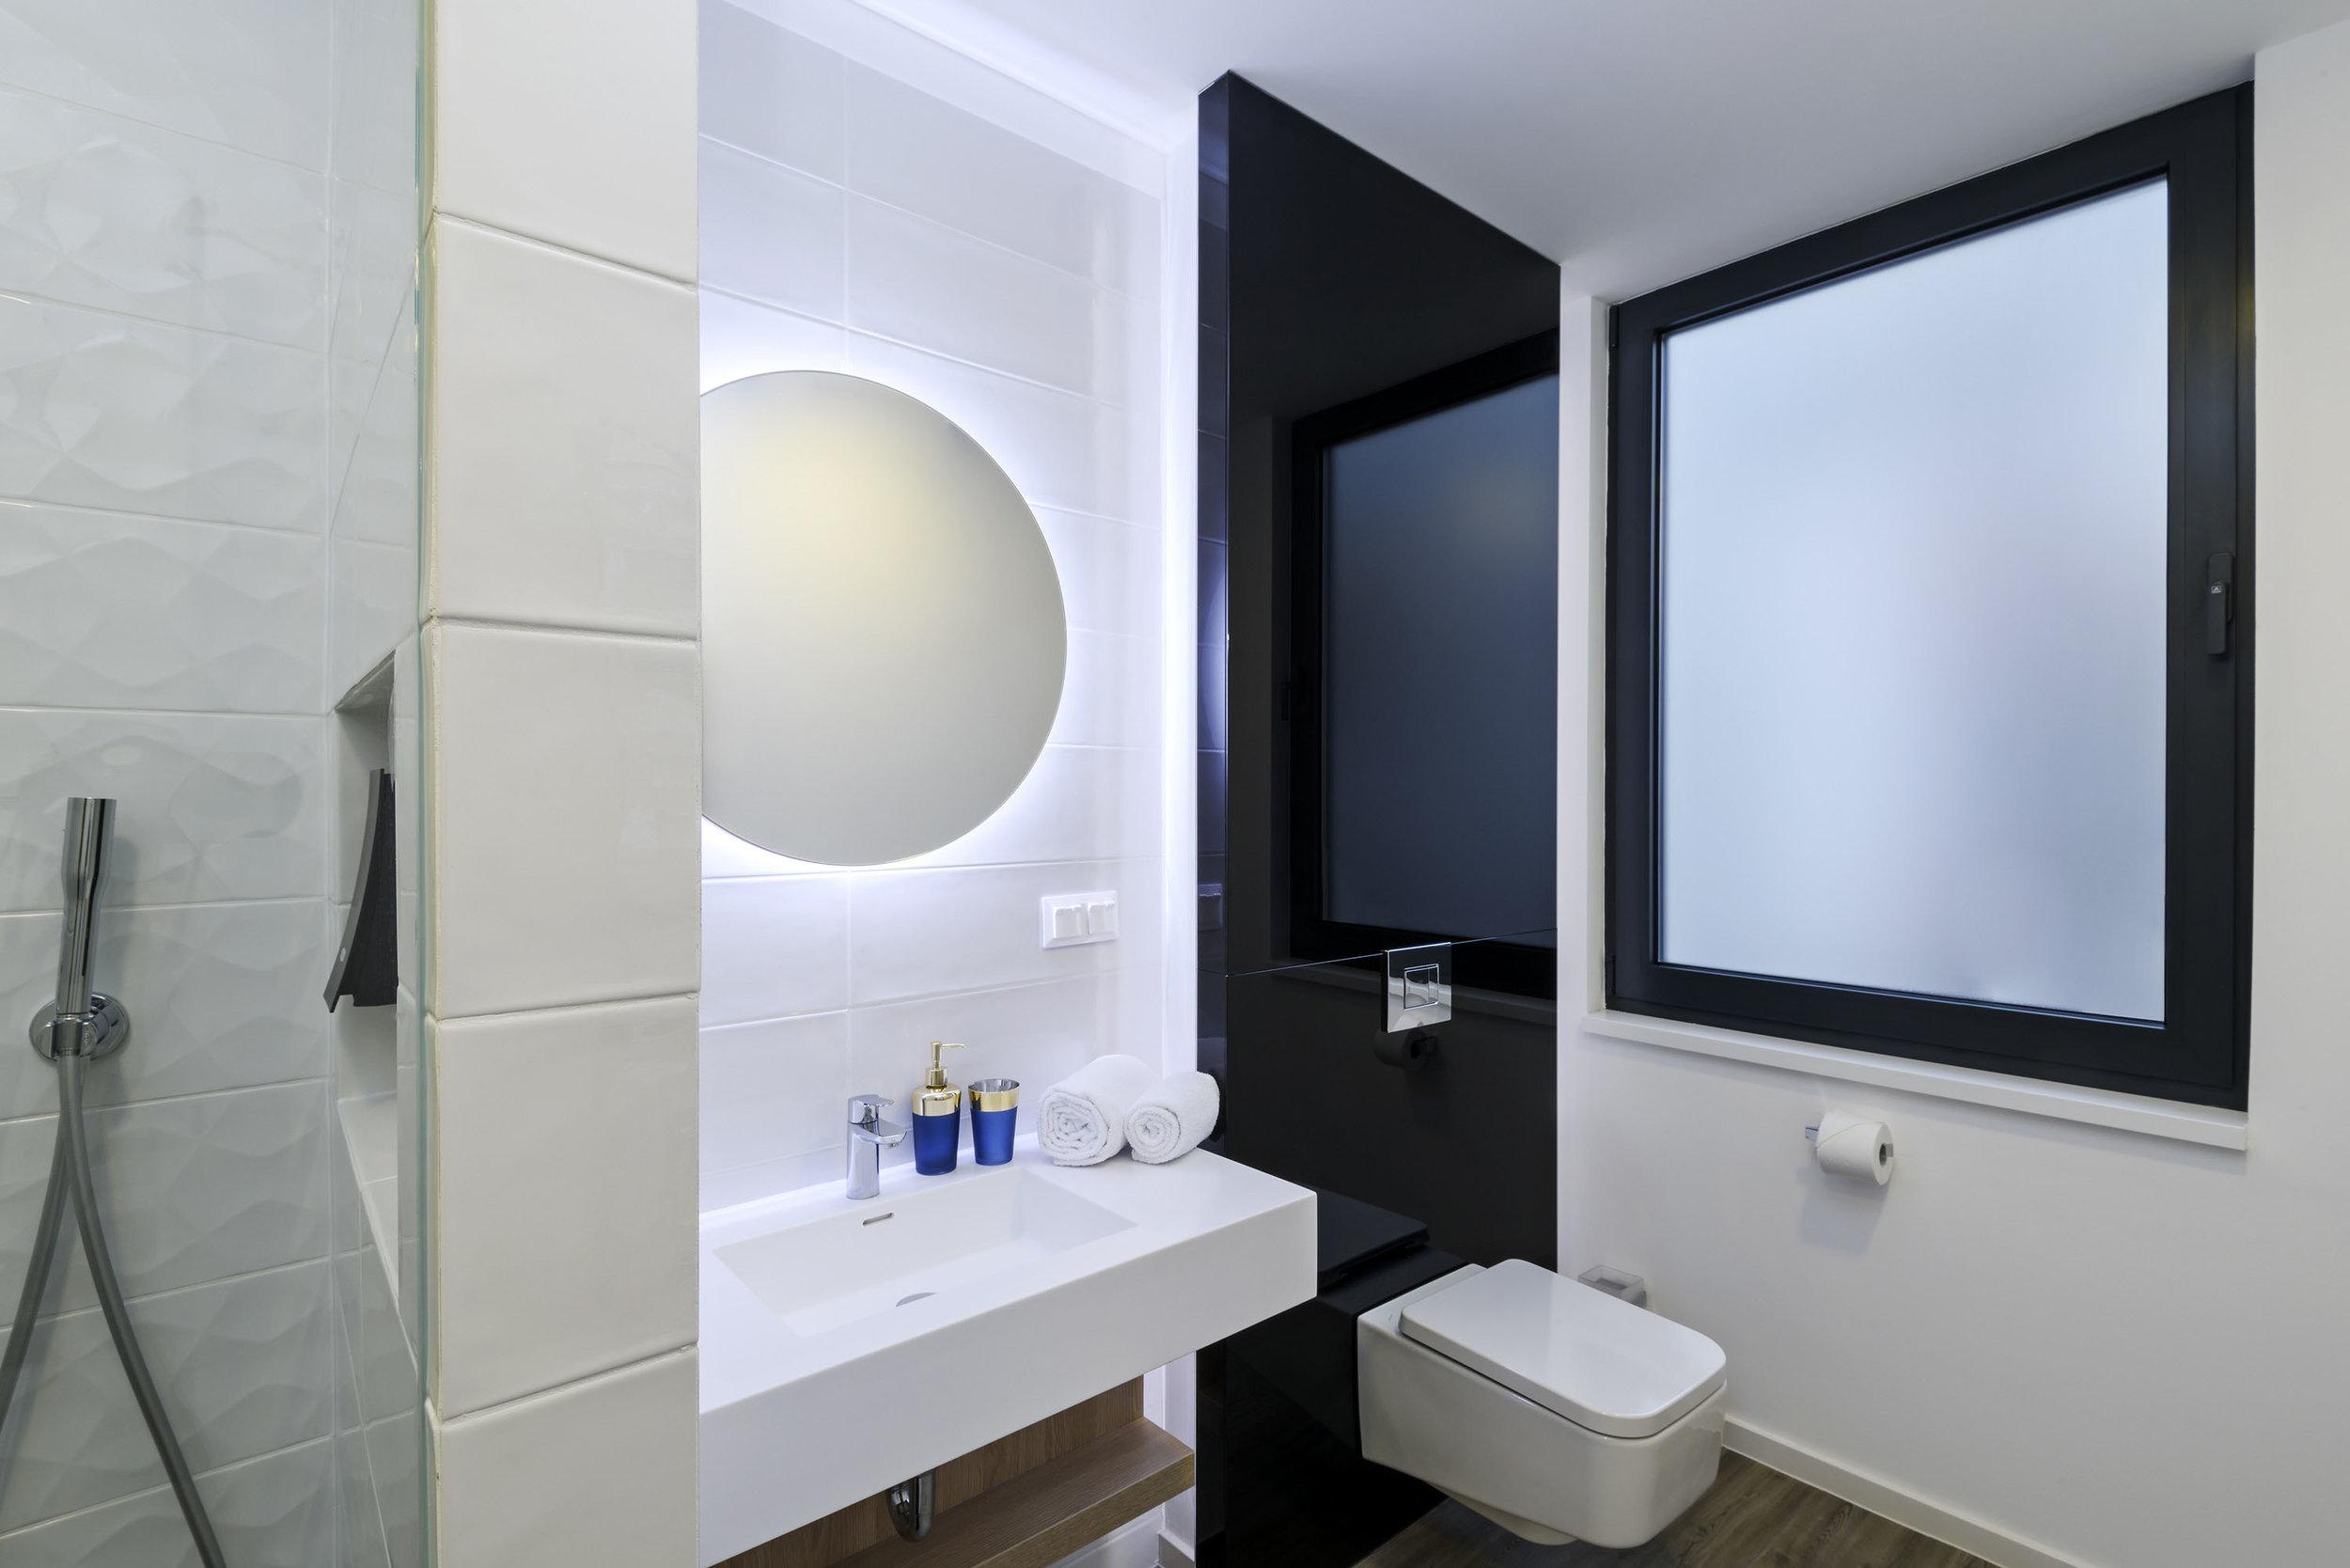 KVI_Hotel_406_01_mod.jpg